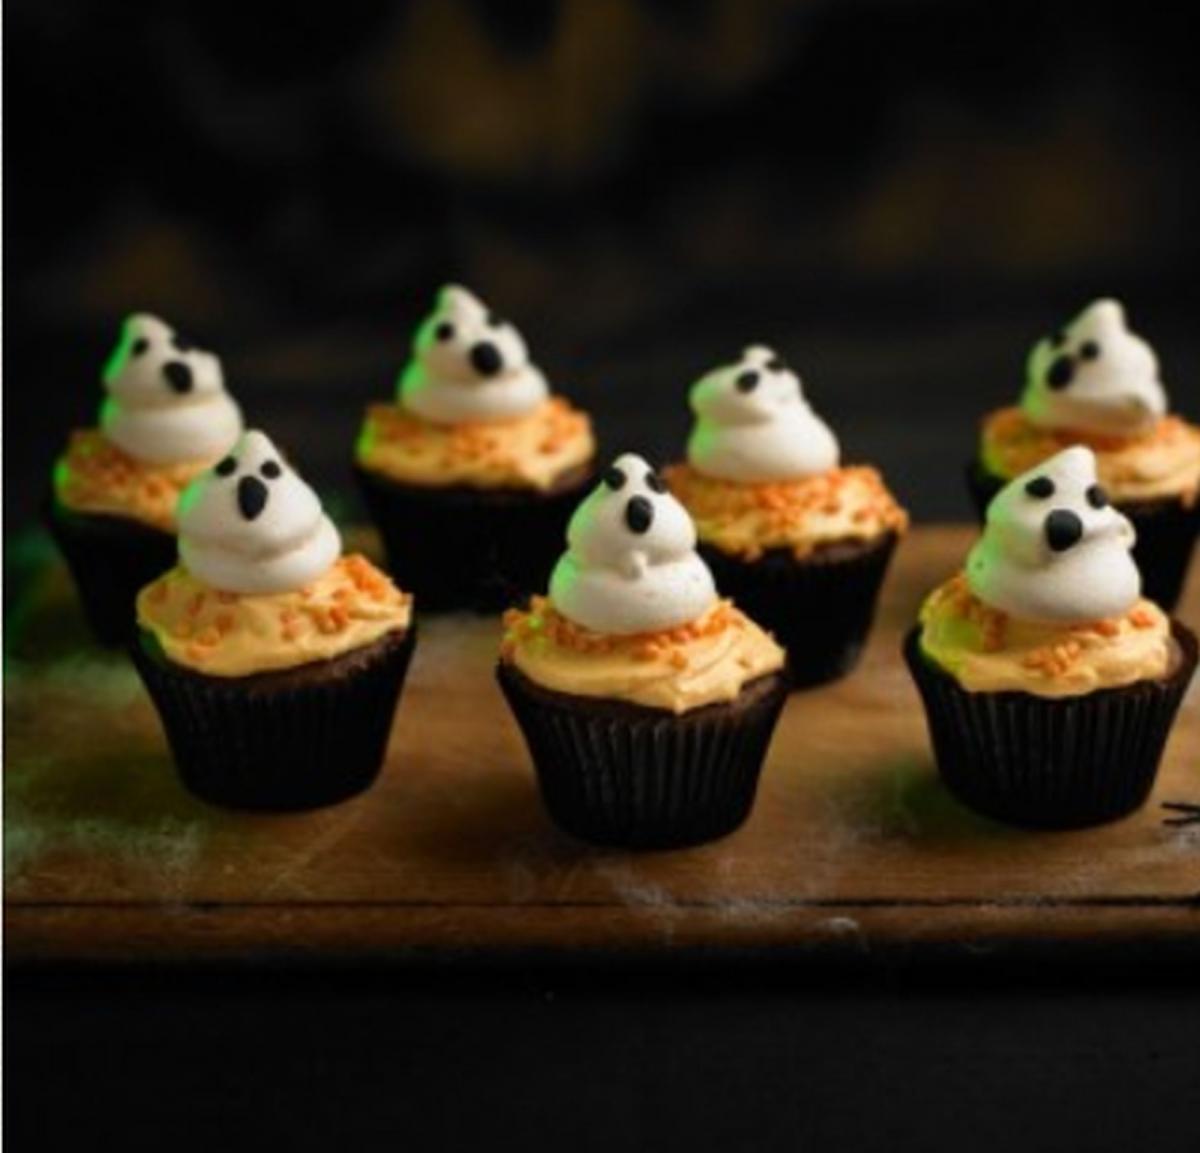 recipes: two devilishly good cakes to bake this halloween